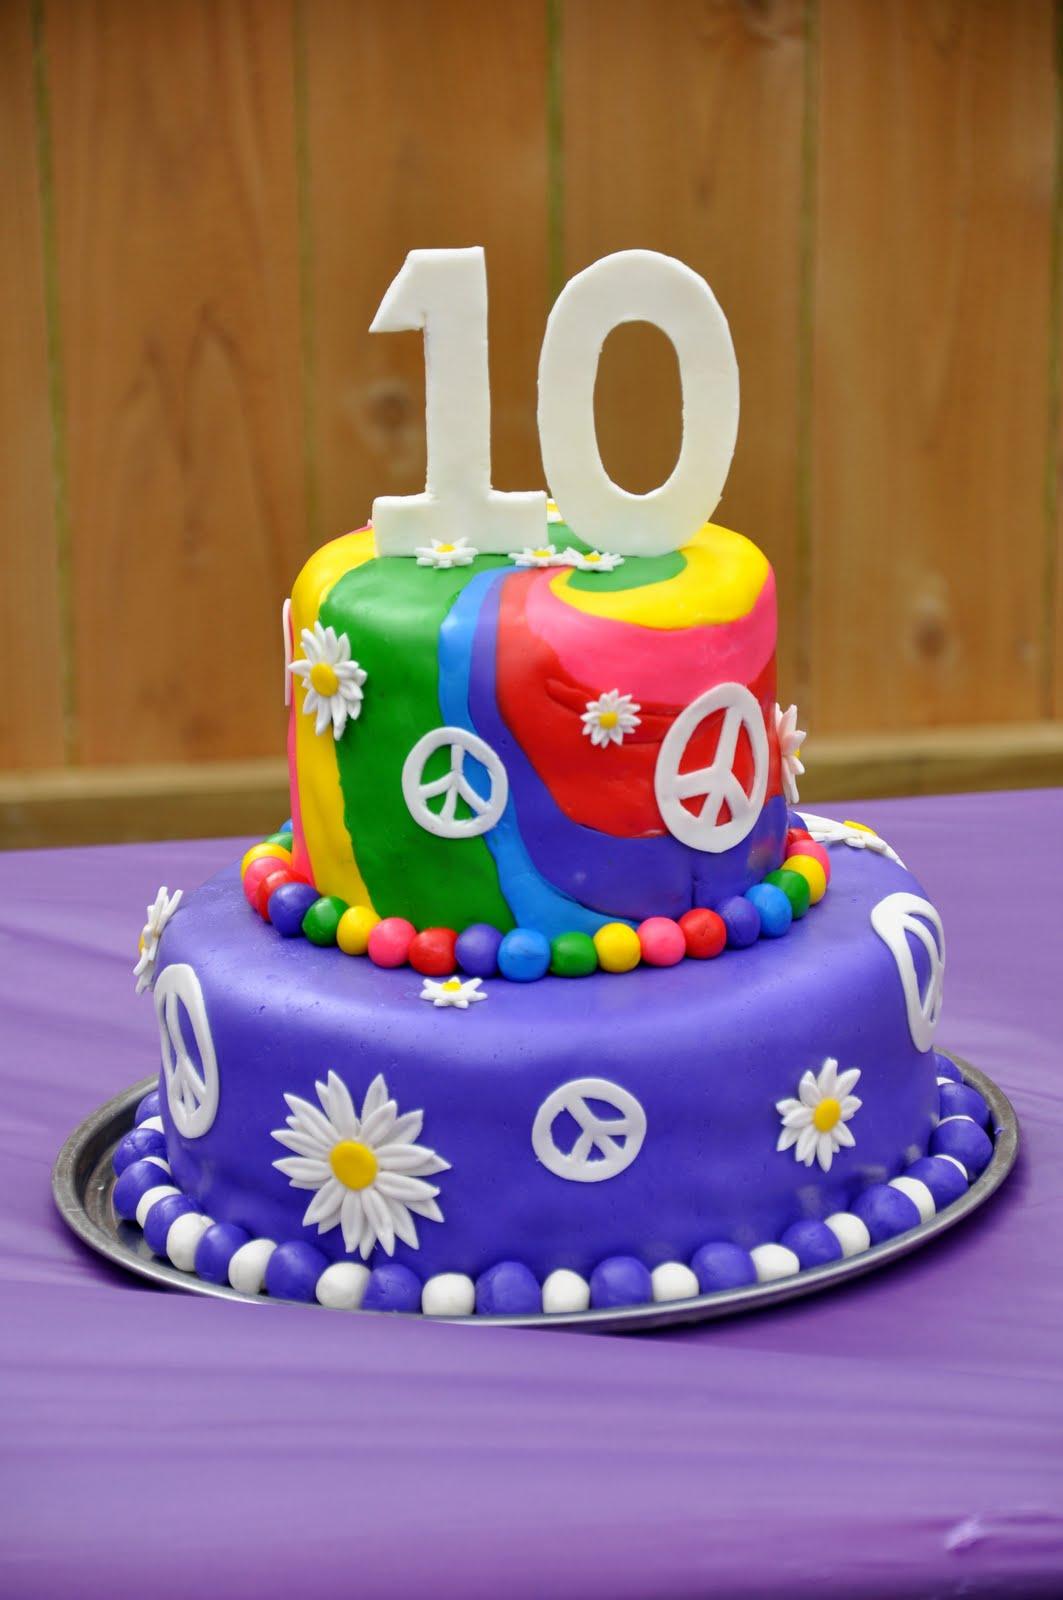 Sweet Cakes Tie Dye Cake